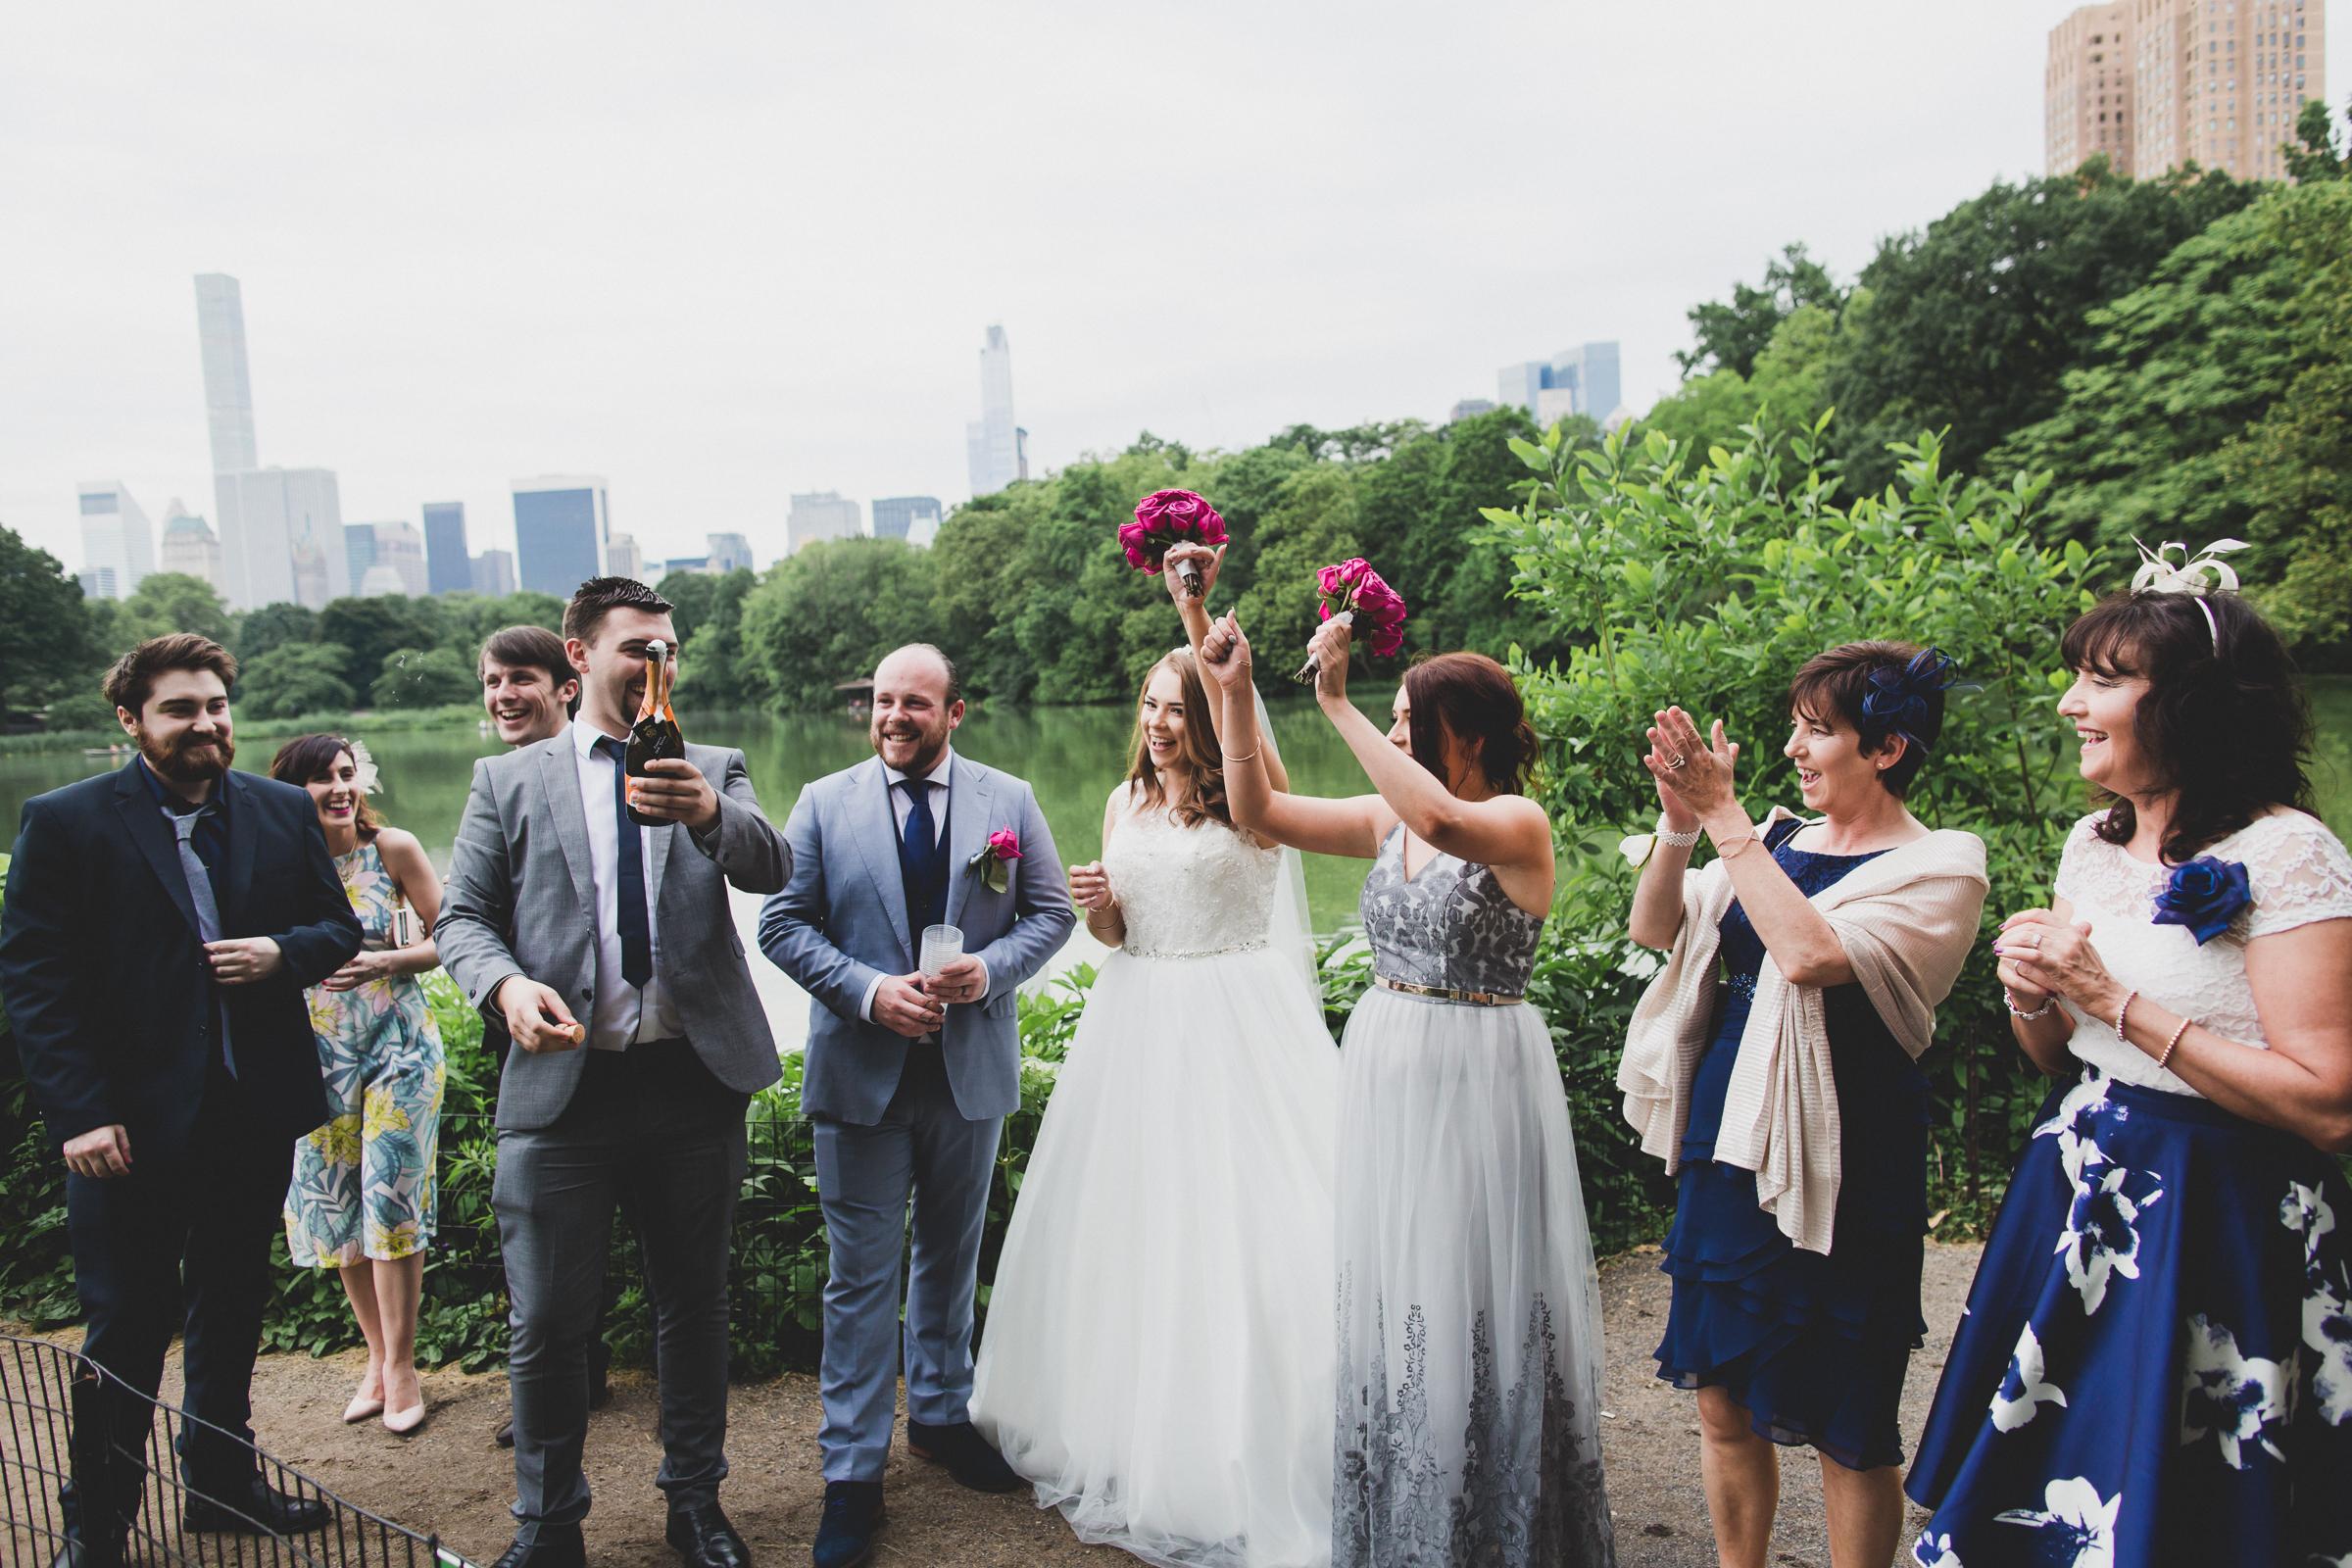 NYC-Central-Park-Elopement-New-York-Documentary-Wedding-Photographer-Dumbo-Brooklyn-Bridge-Park--27.jpg